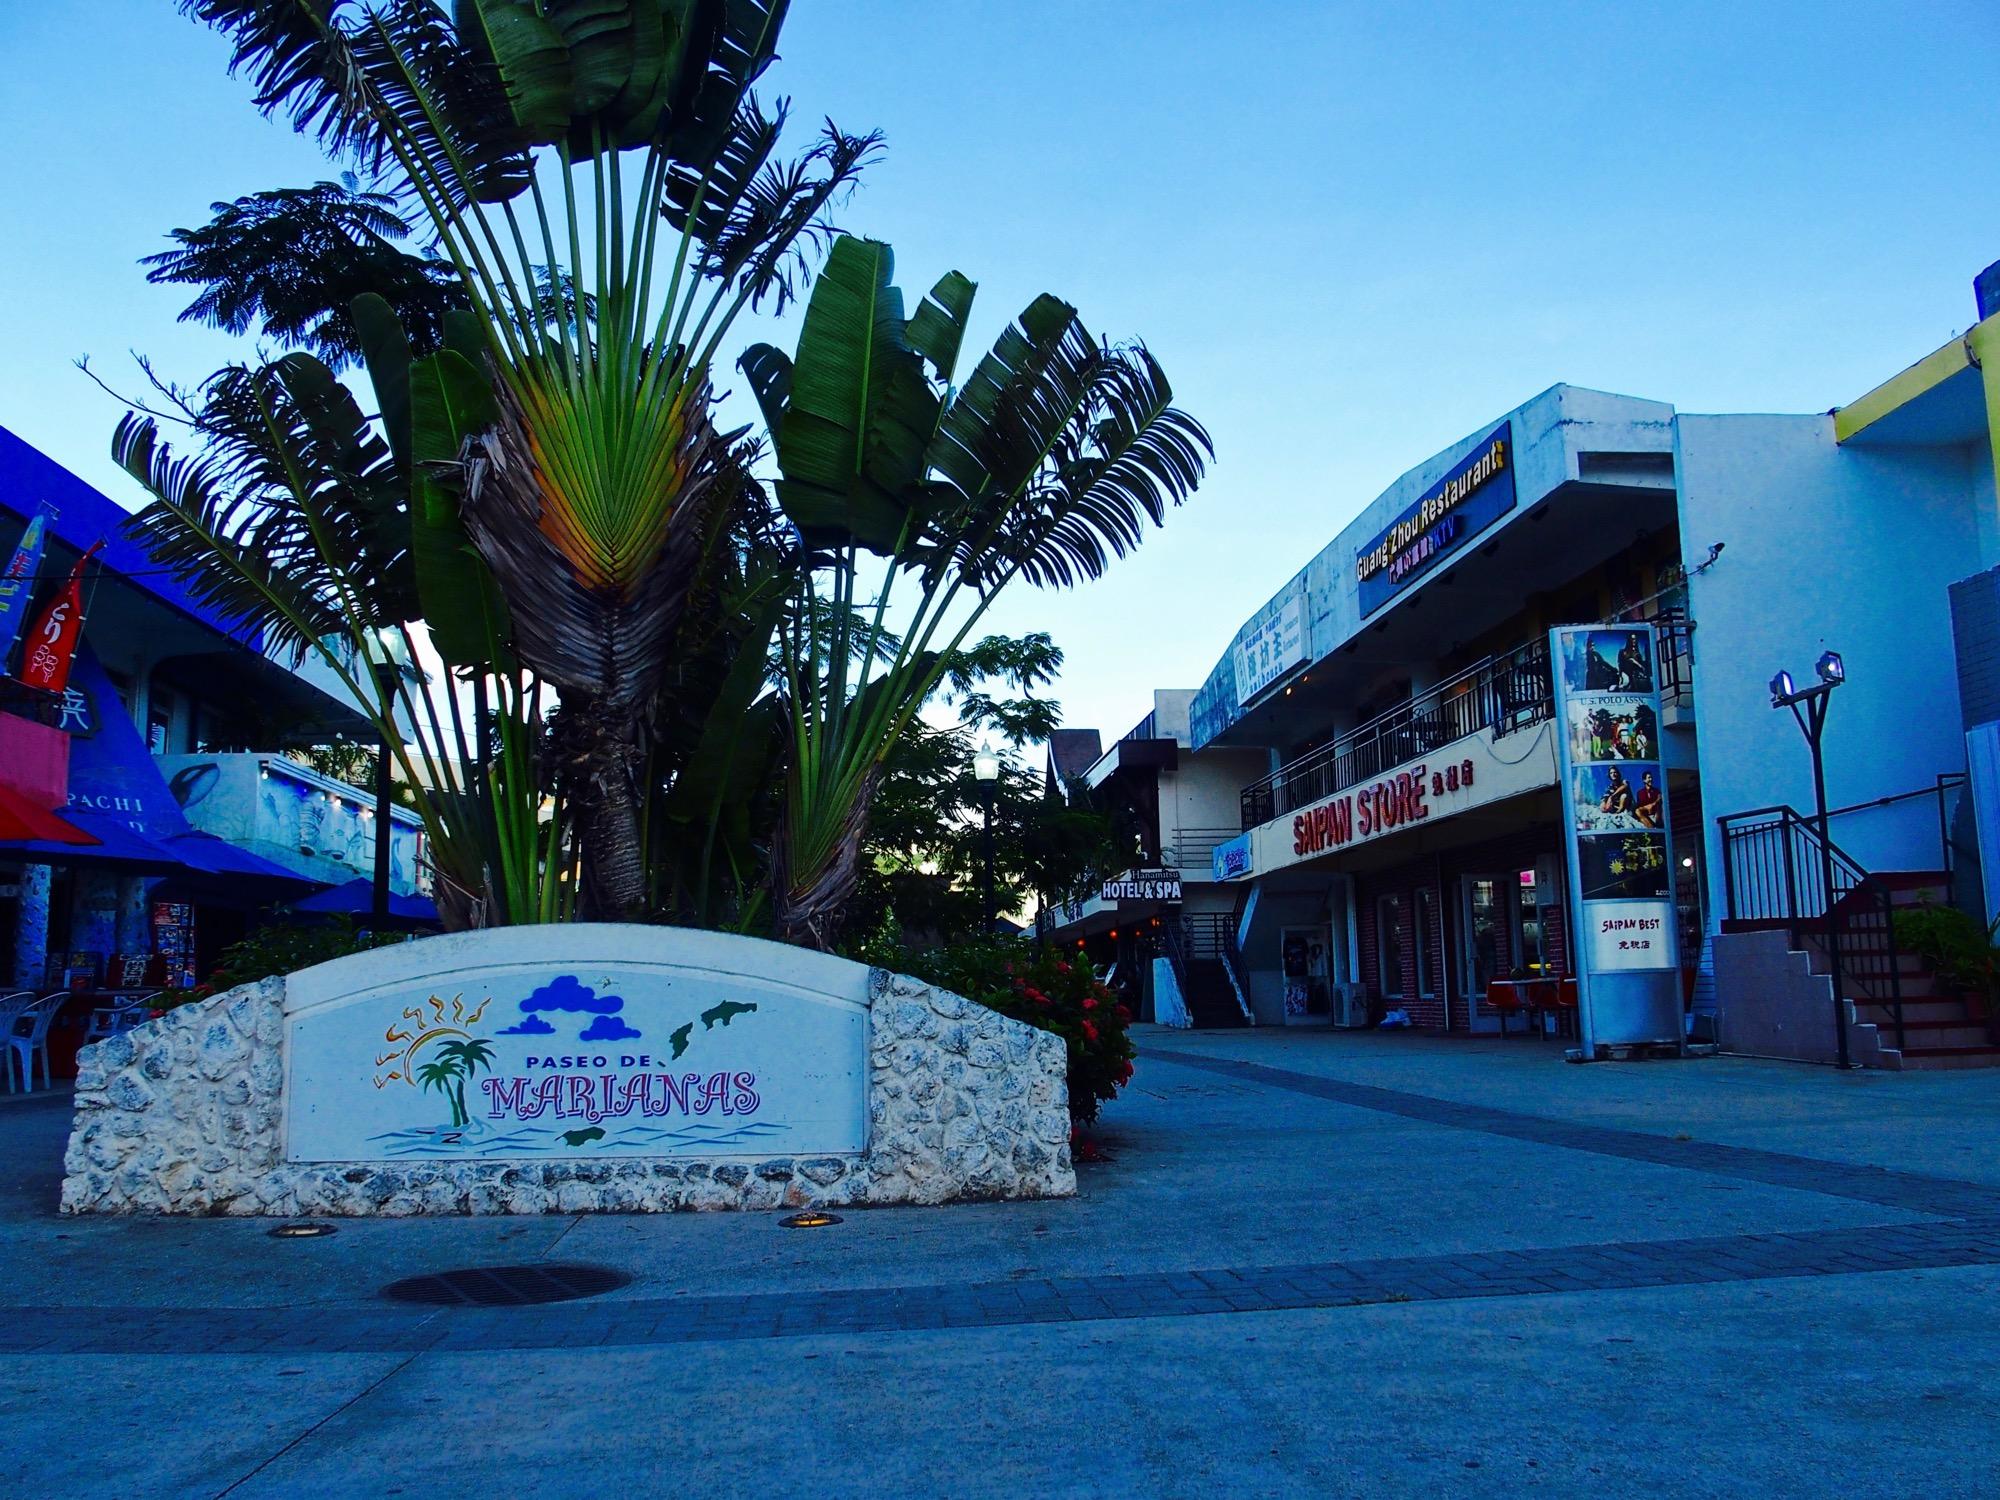 Paseo De Marianas